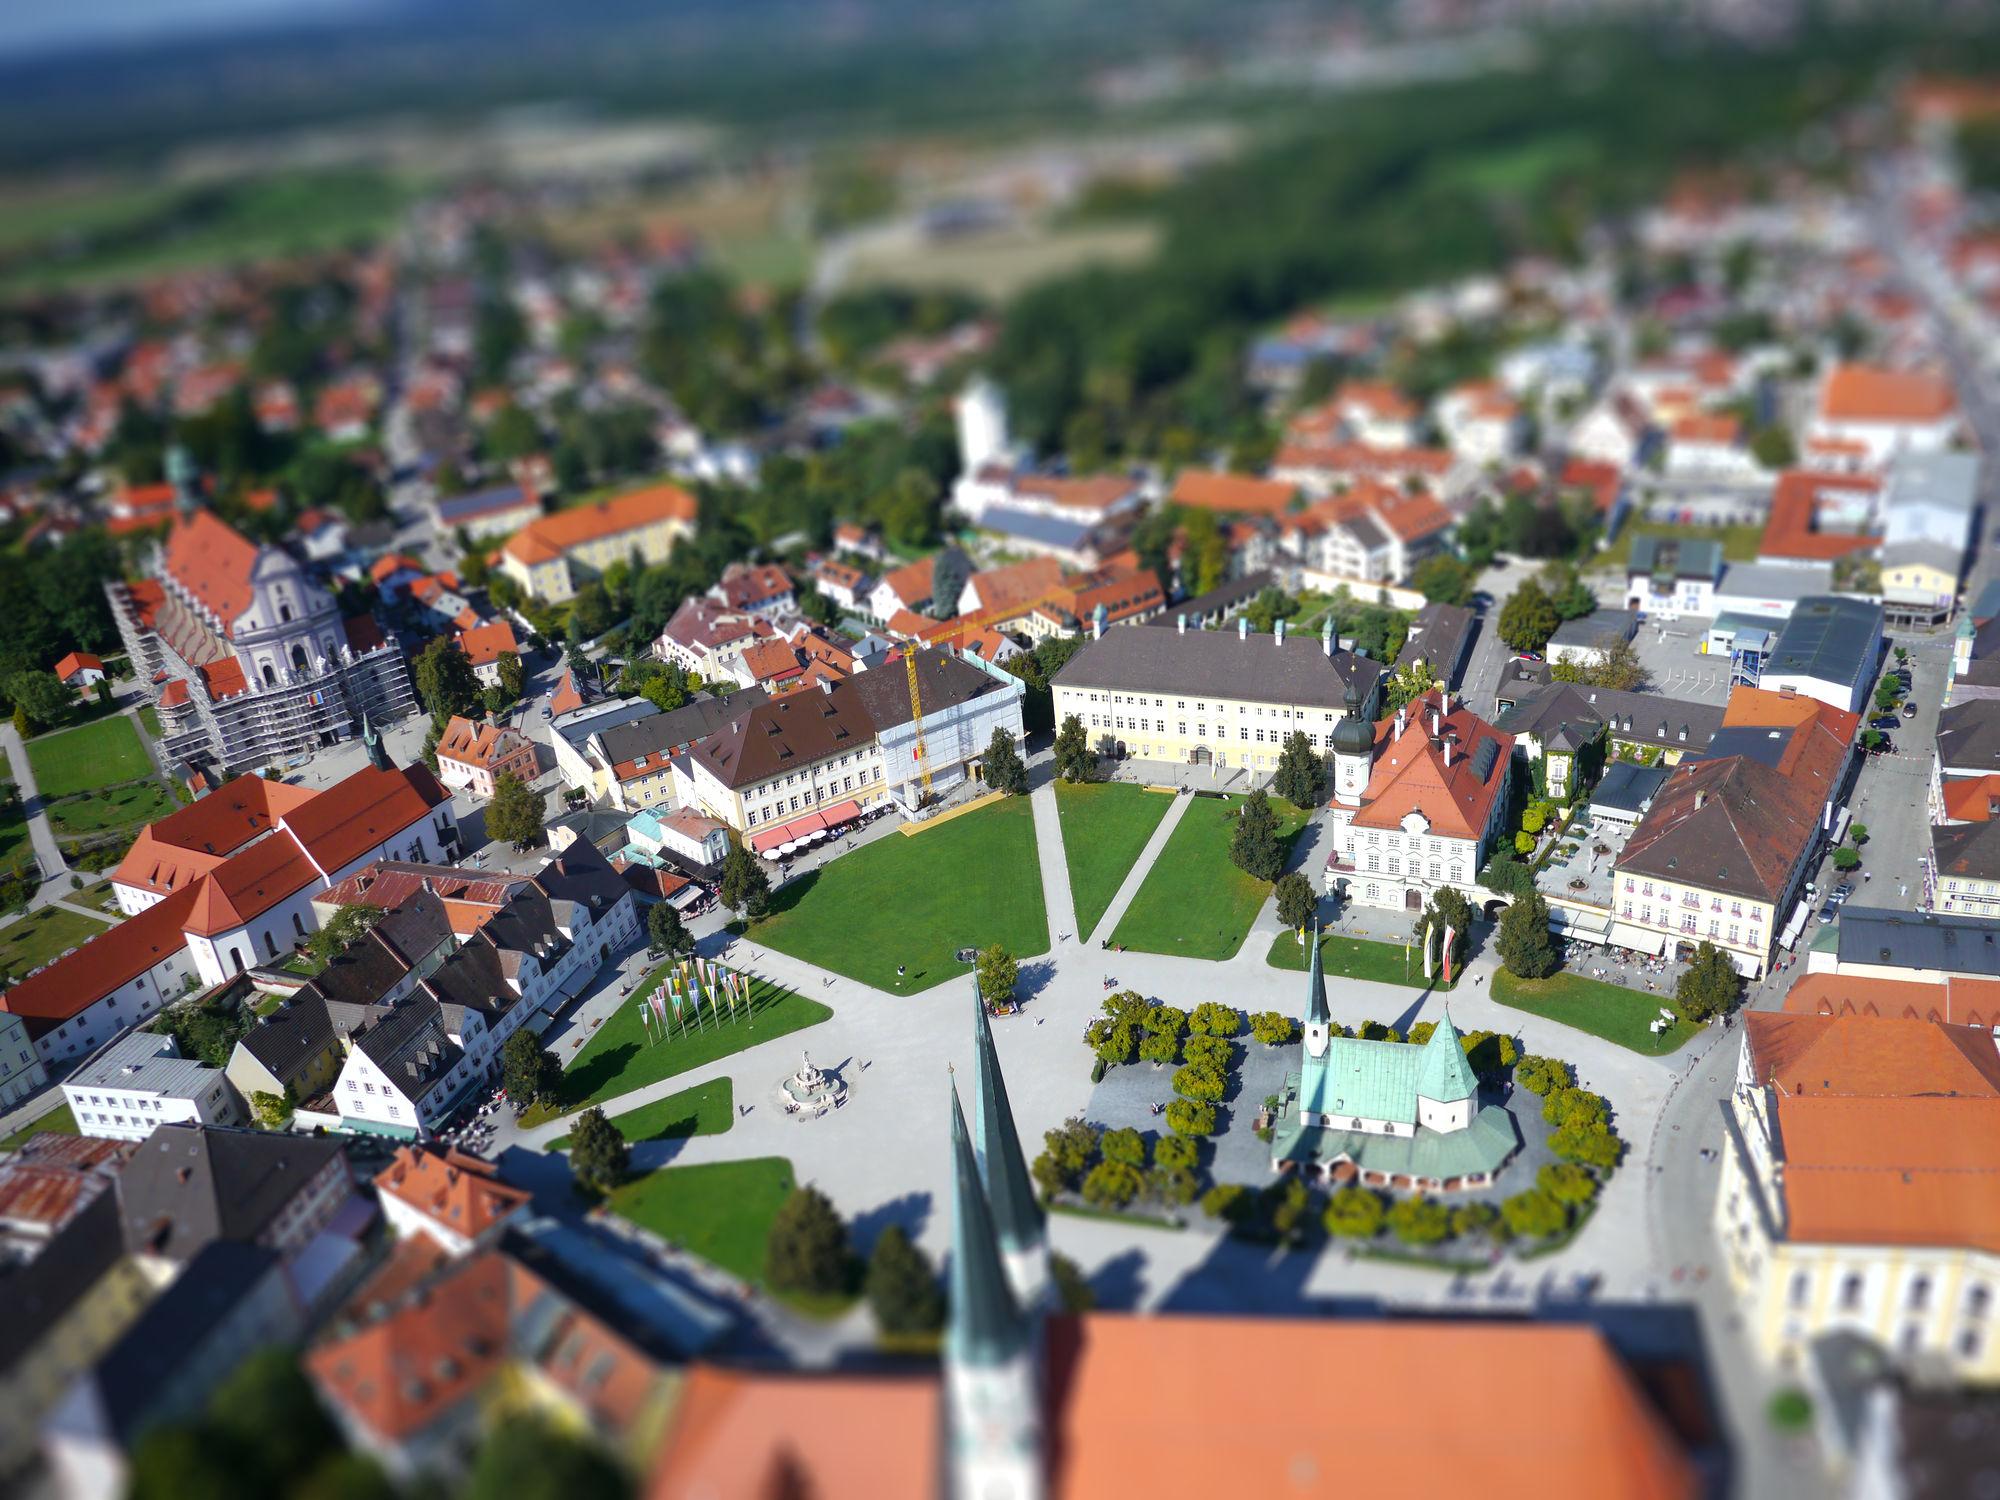 Luftbild vom Altöttinger Kapellplatz mit Tilt-Shift Effekt